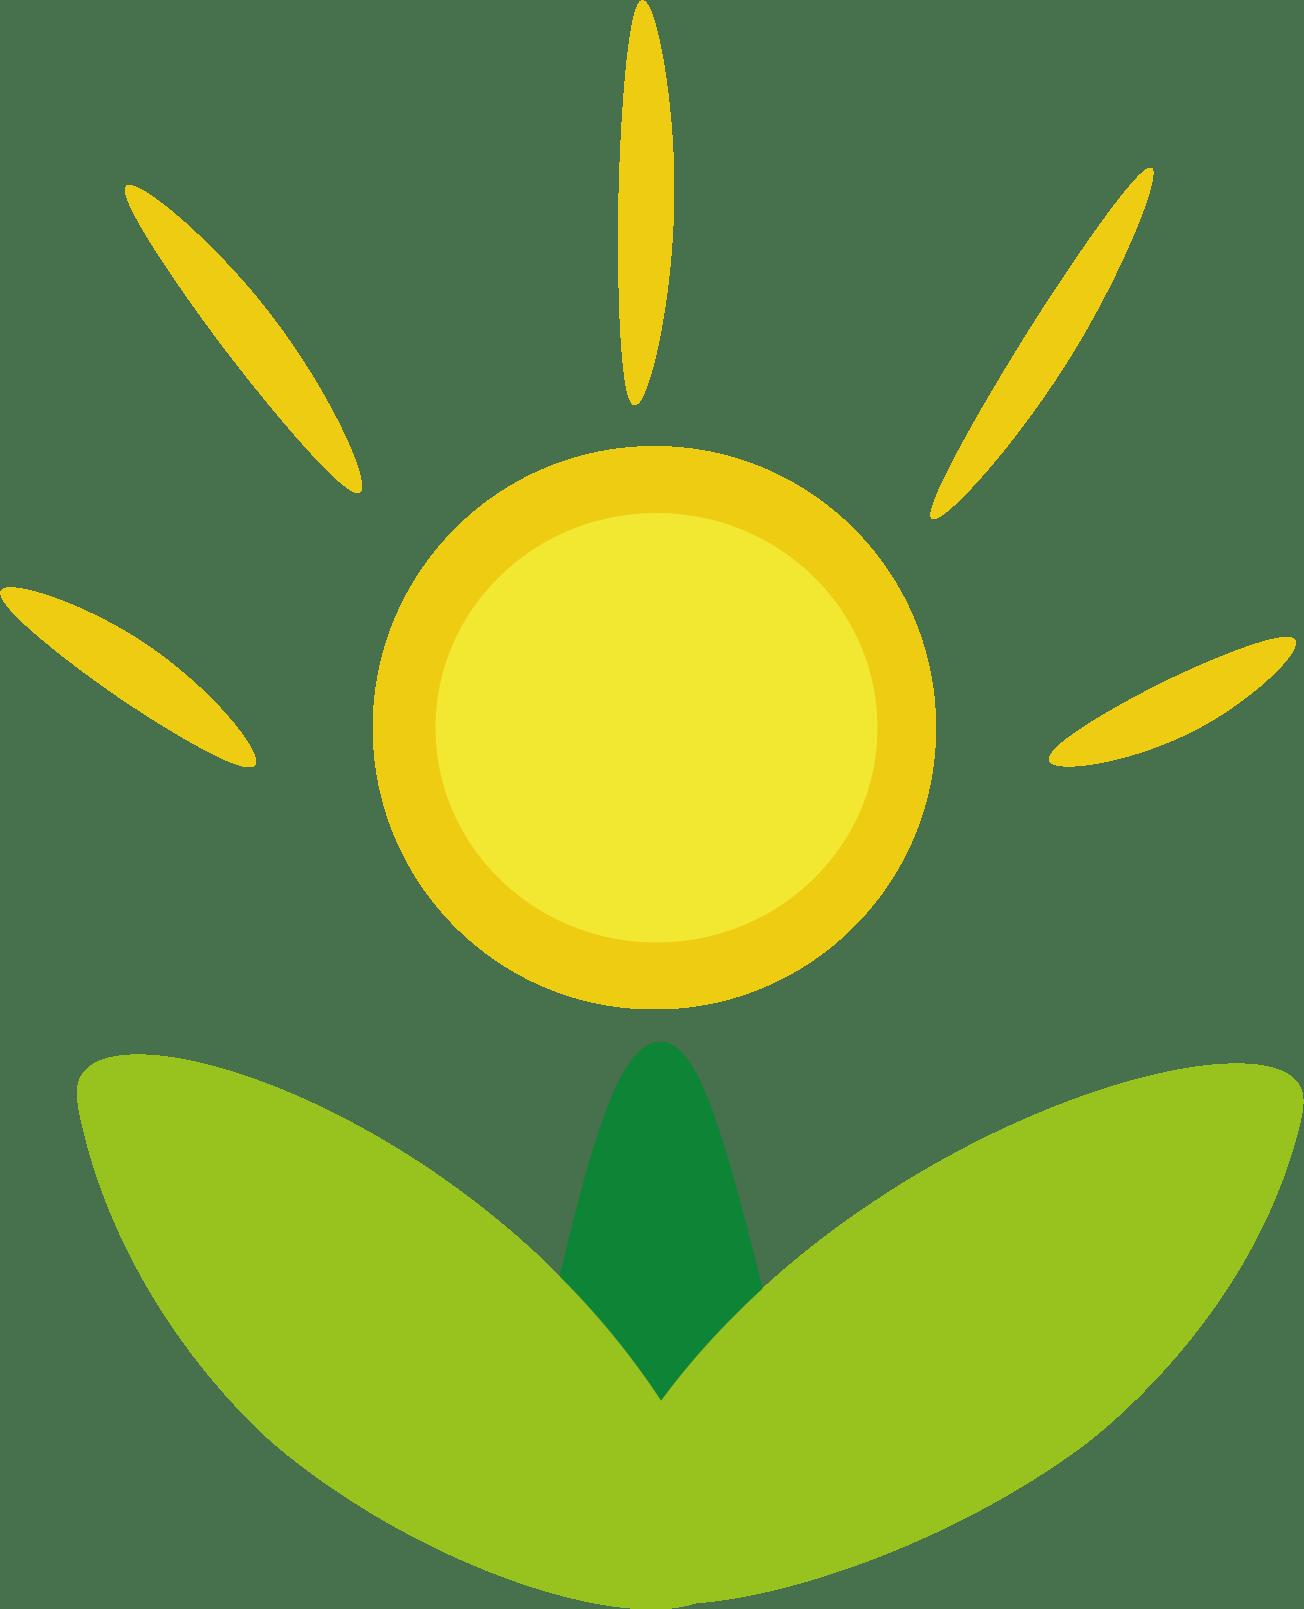 Kreative Kommunikation Agency Landing Page Raidboxes Klimapositiv